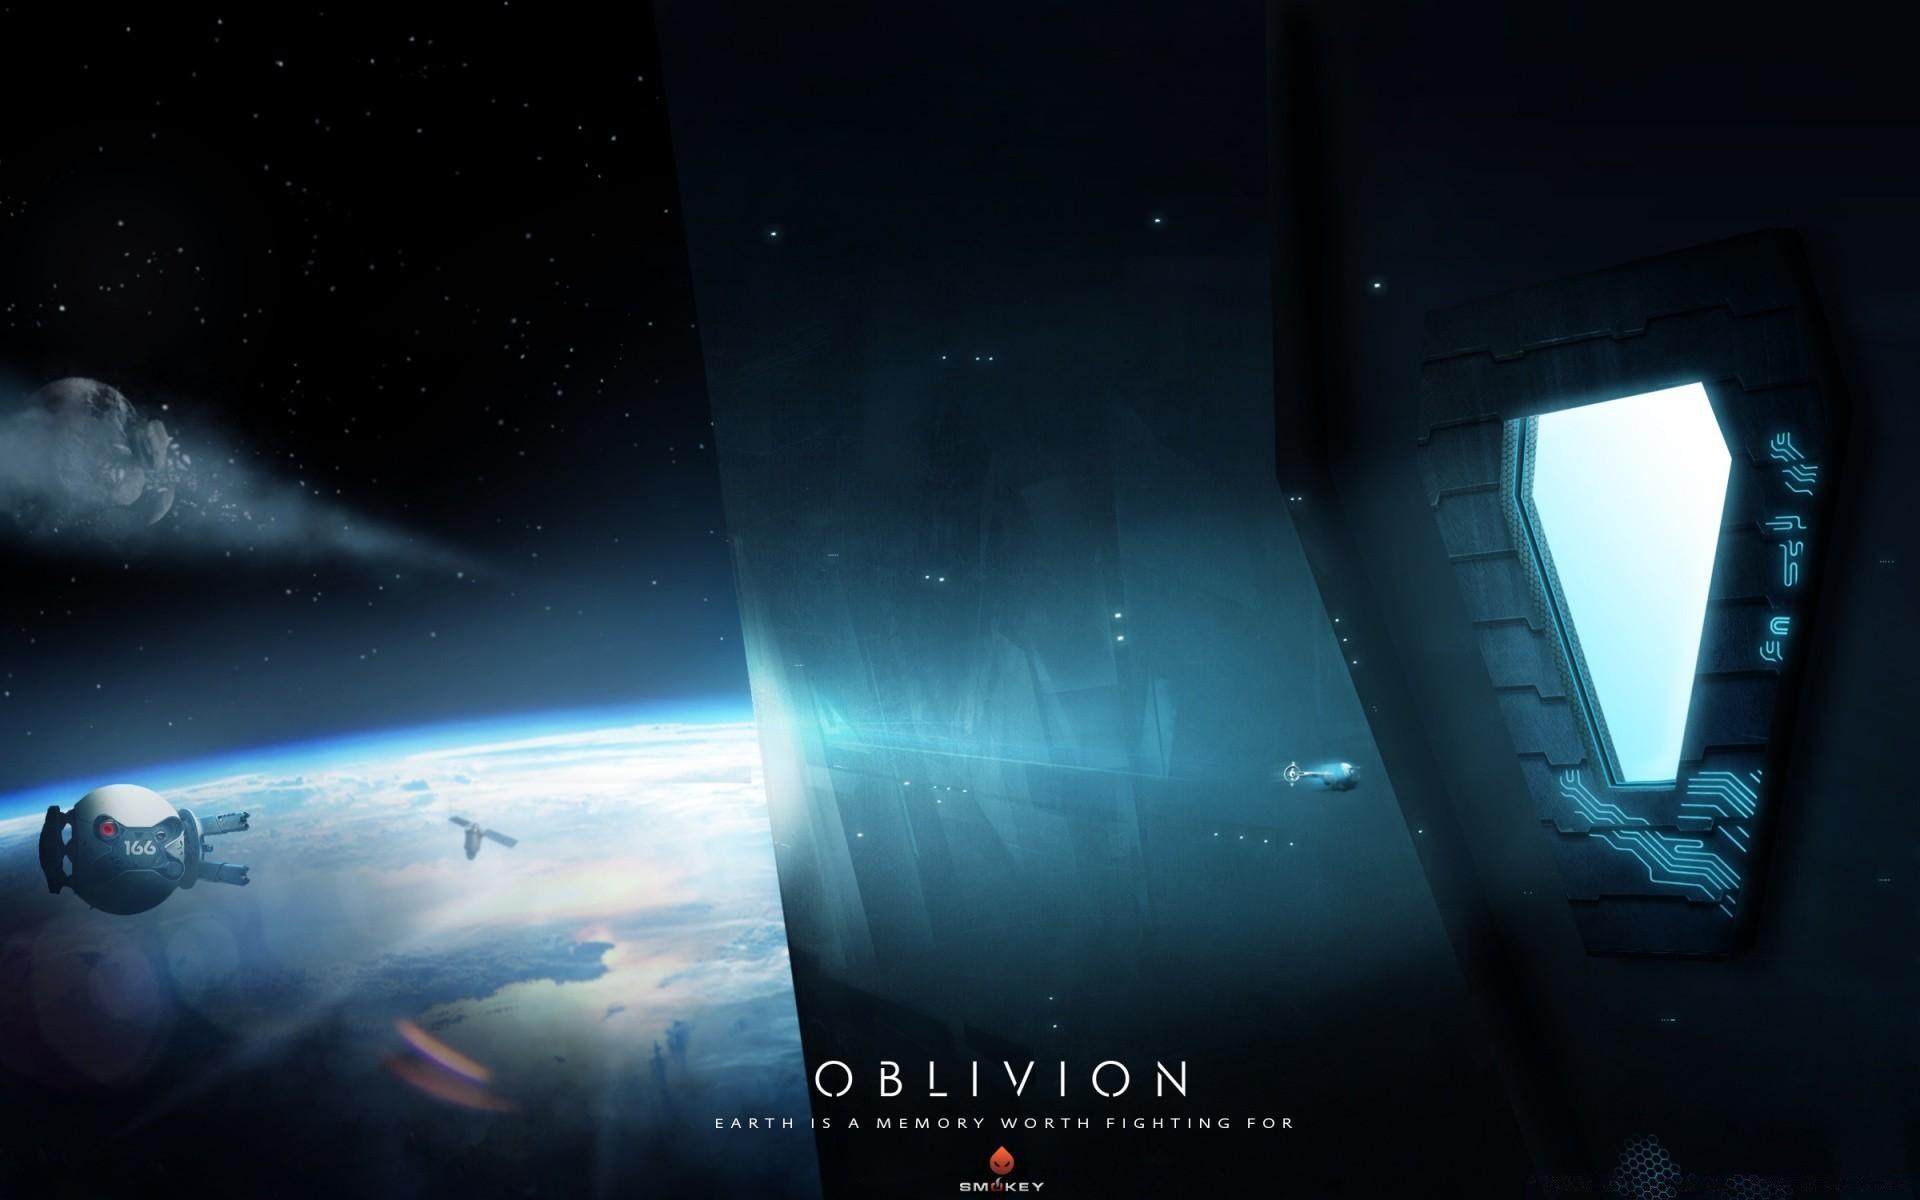 Movies Astronomy Moon Dark Exploration Outdoors Science Space Sun Illuminated Sky Light Solar System Travel Bright